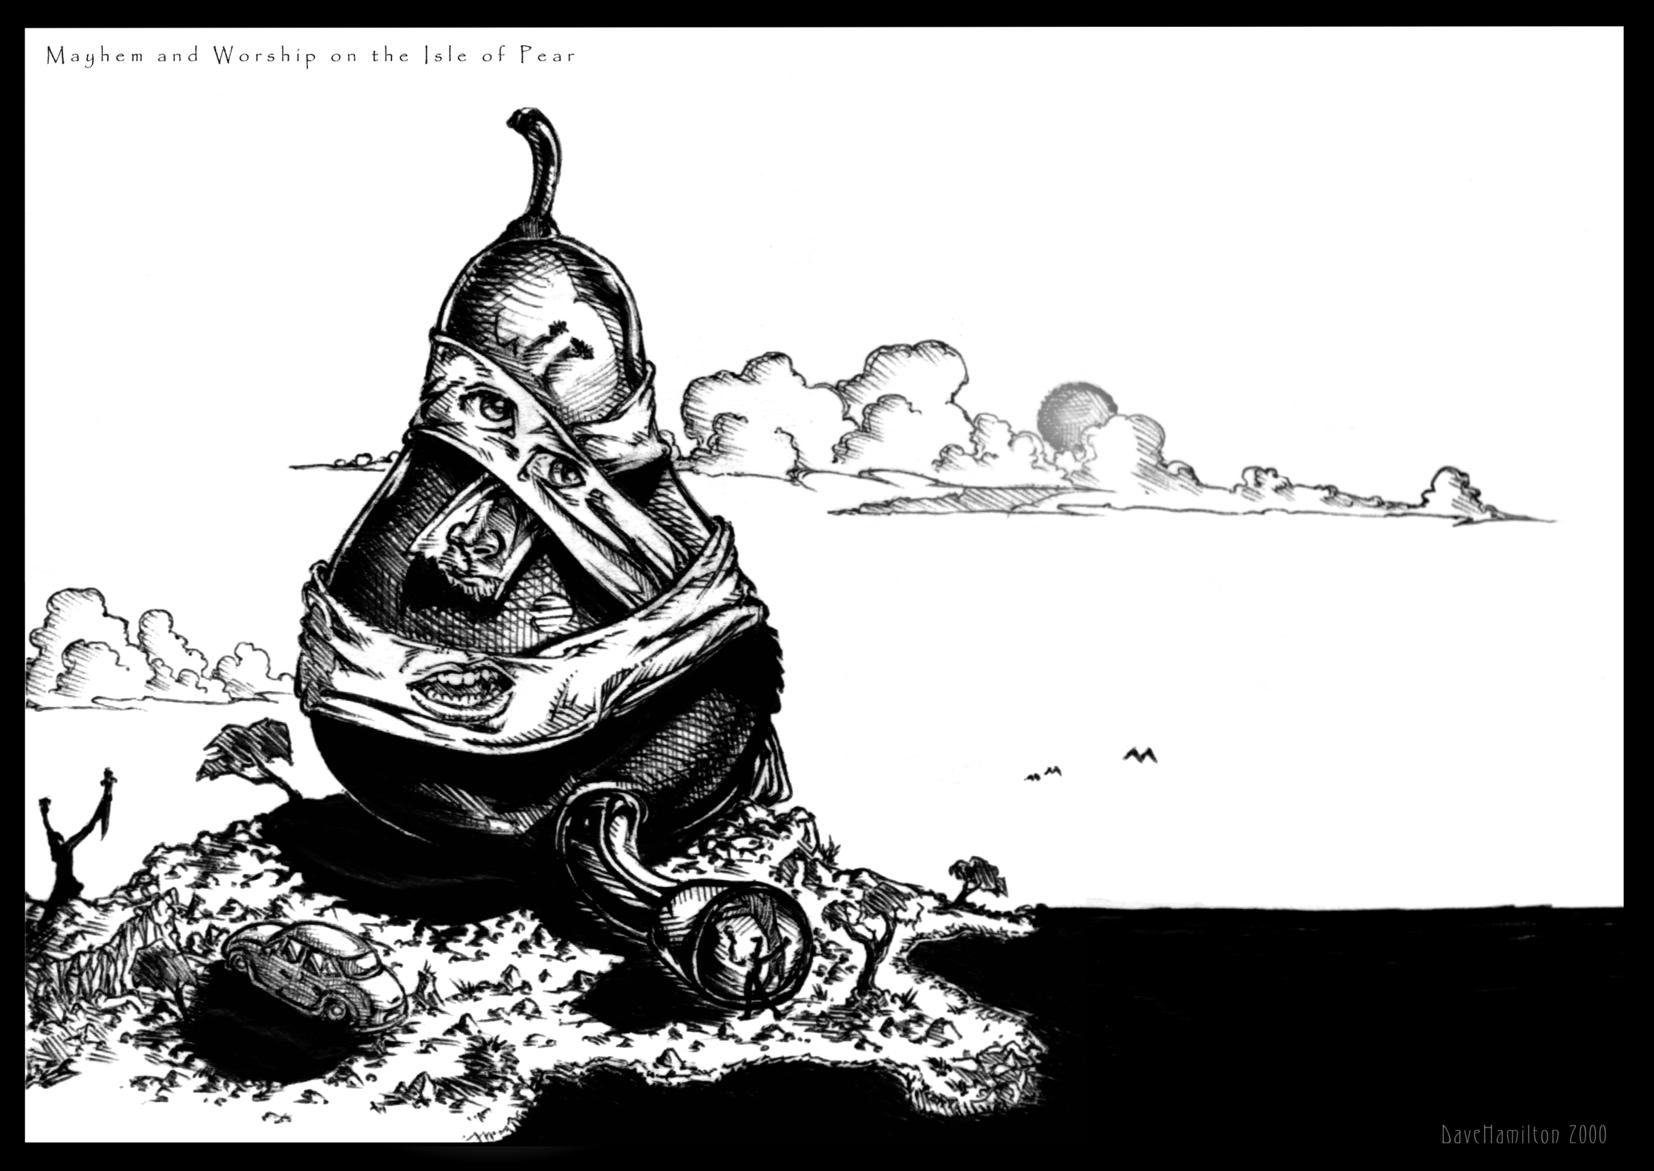 2000 - Mayhem and Worship on the Isle of Pear